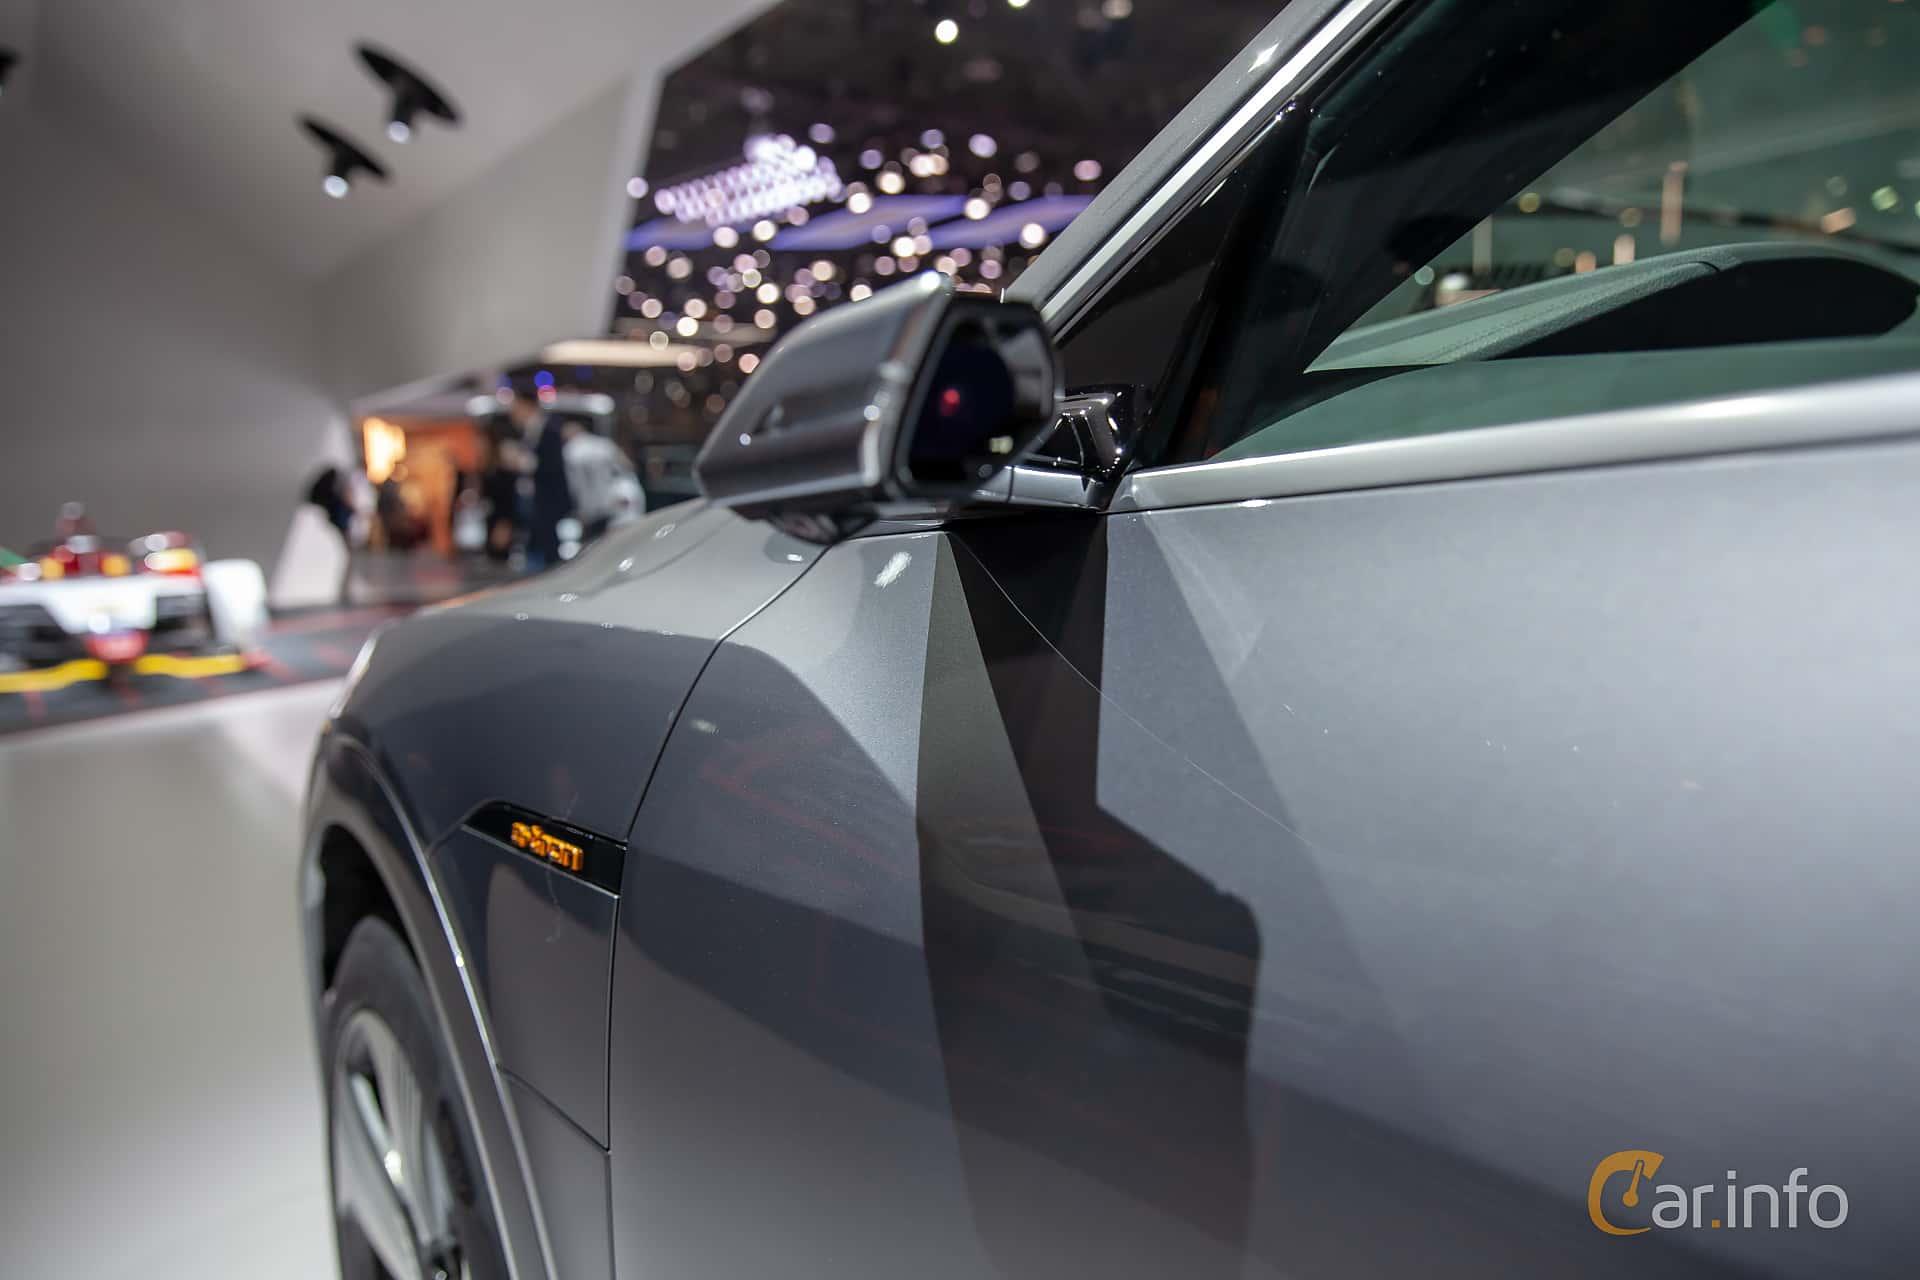 Audi e-tron 55 quattro  Single Speed, 408hp, 2019 at Geneva Motor Show 2019